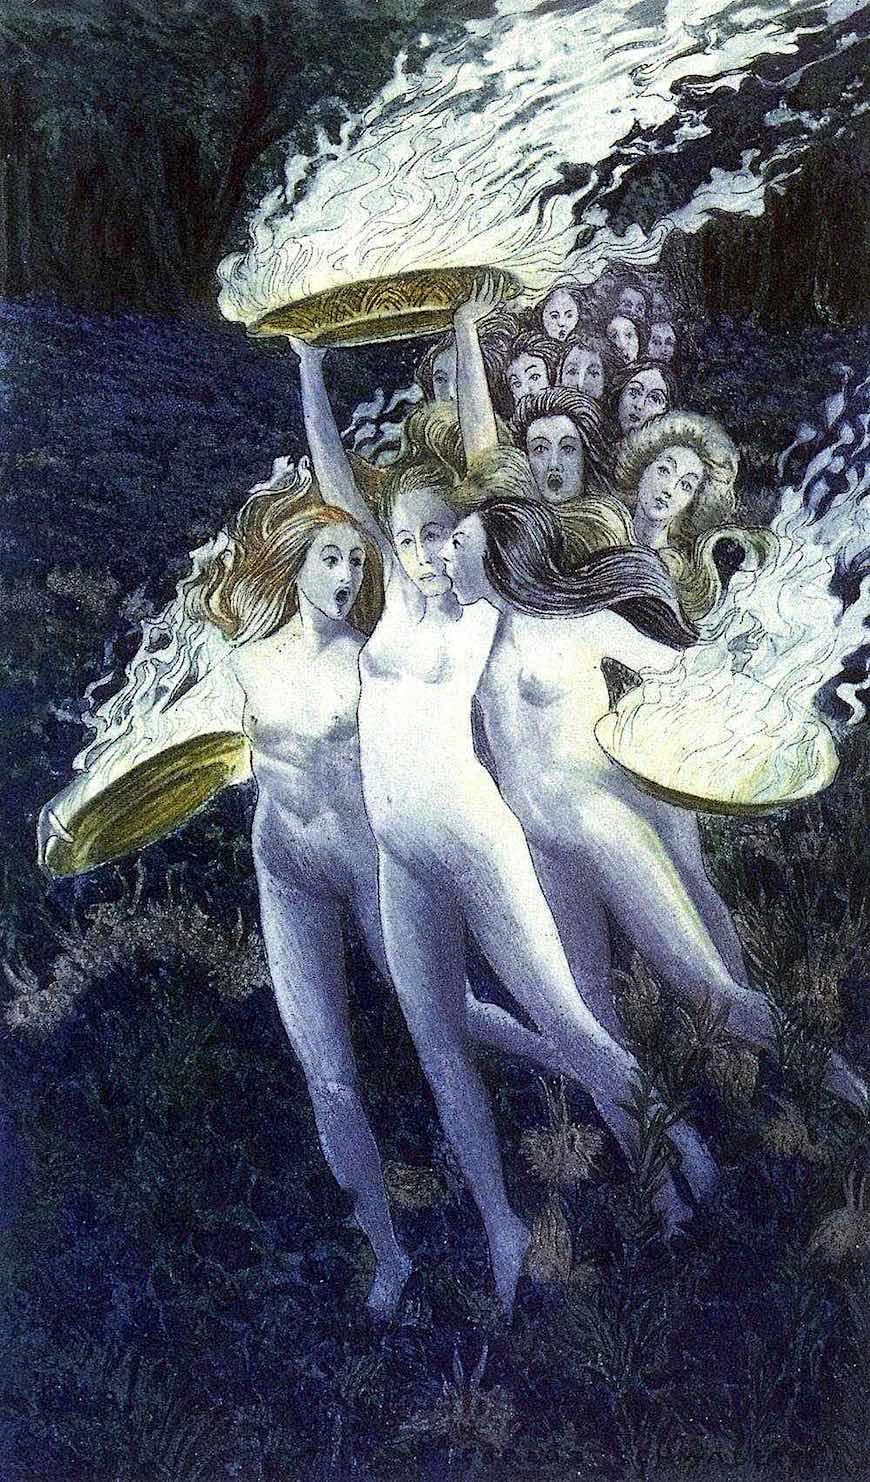 Carlos Schwabe art, a procession of women